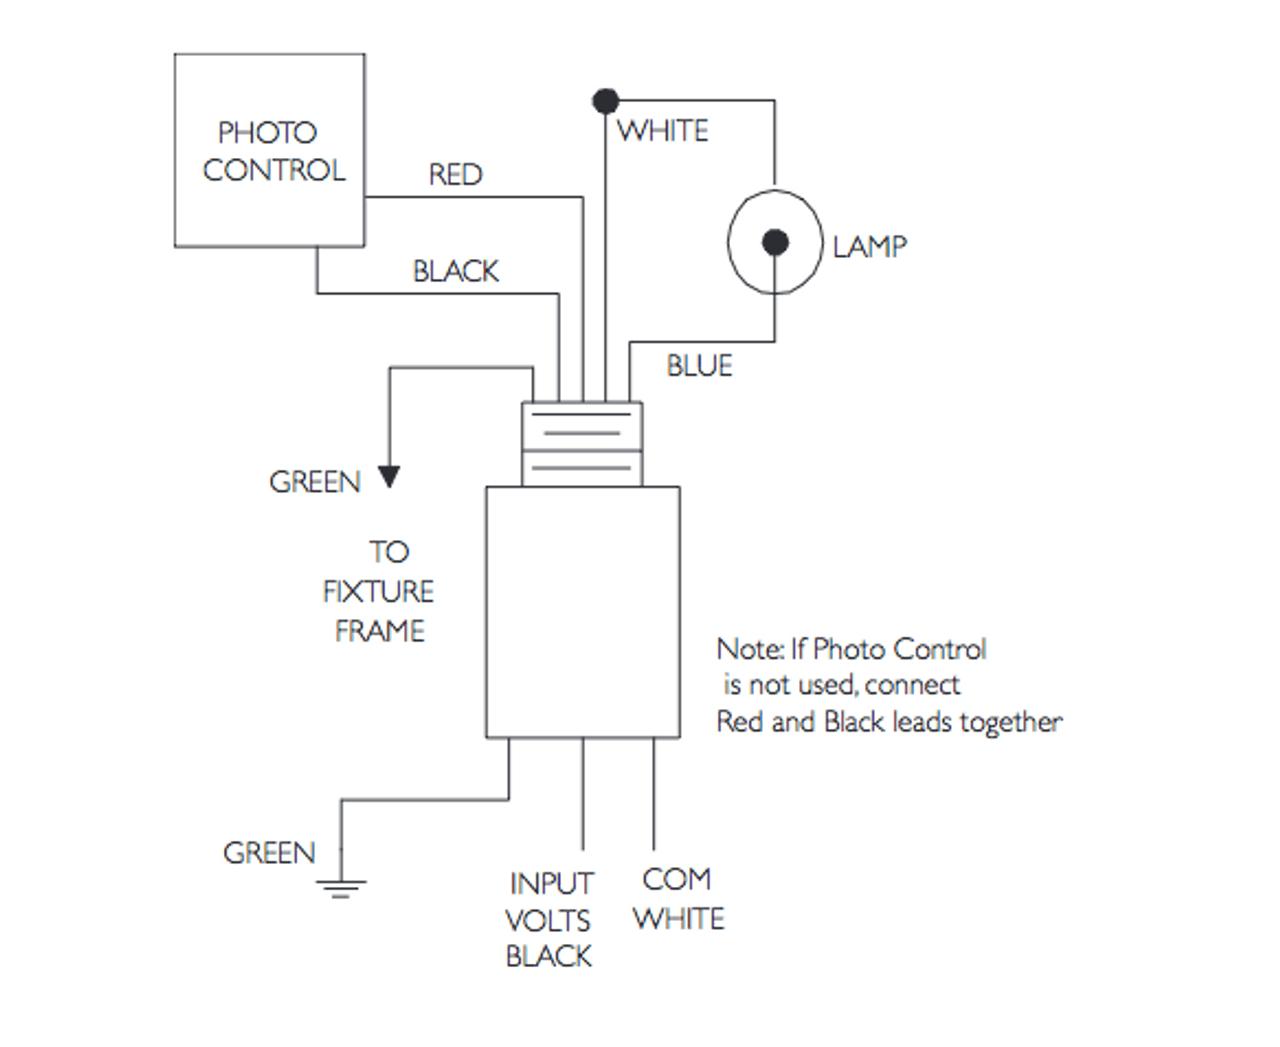 medium resolution of advance hps ballast wiring diagram wiring diagram schematic 100w hps ballast kit wiring diagram